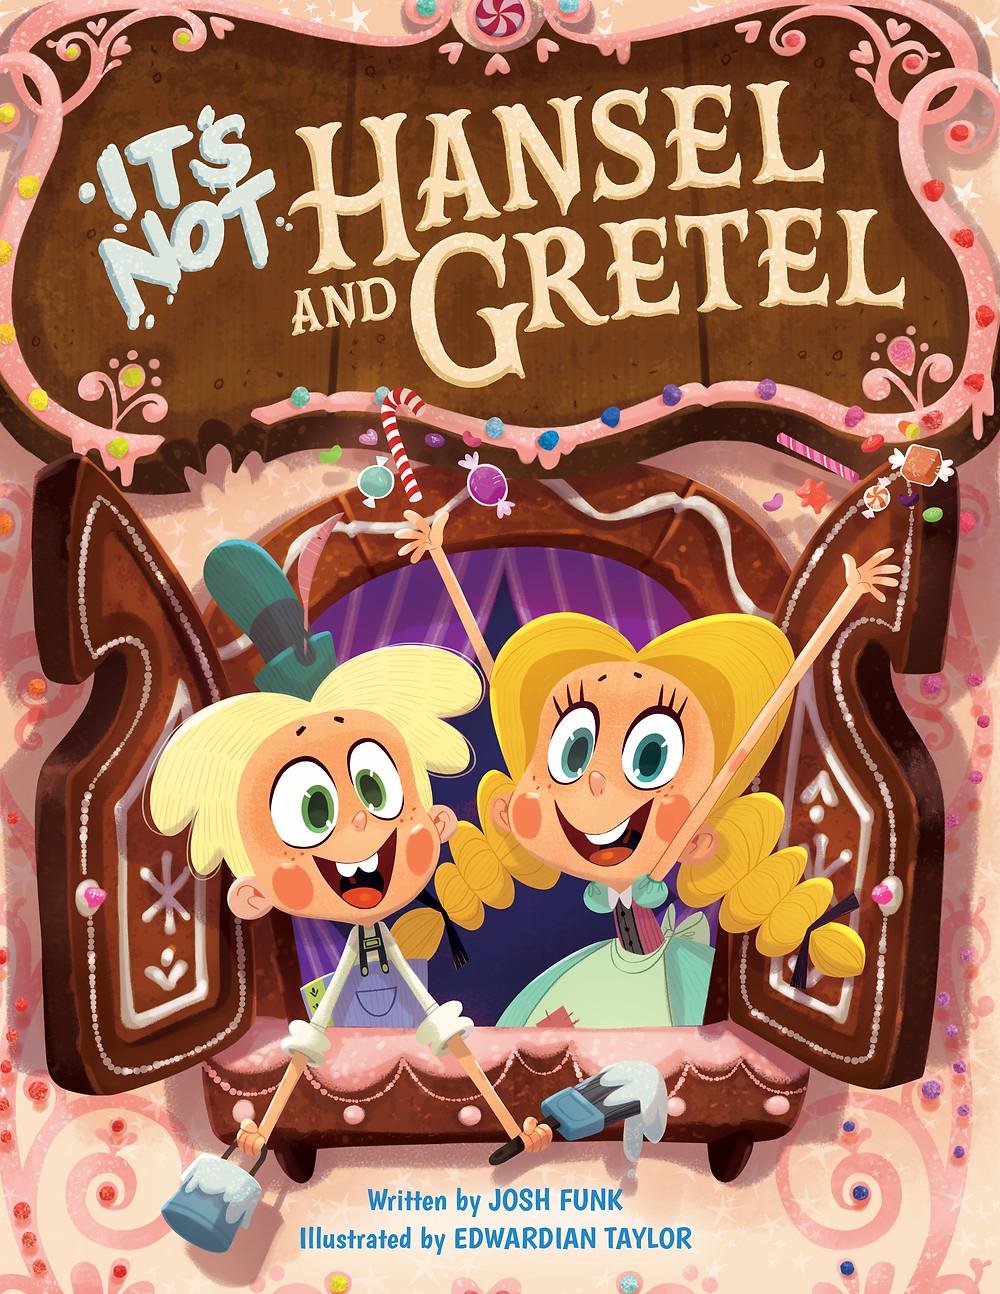 _It's Not Hansel and Gretel